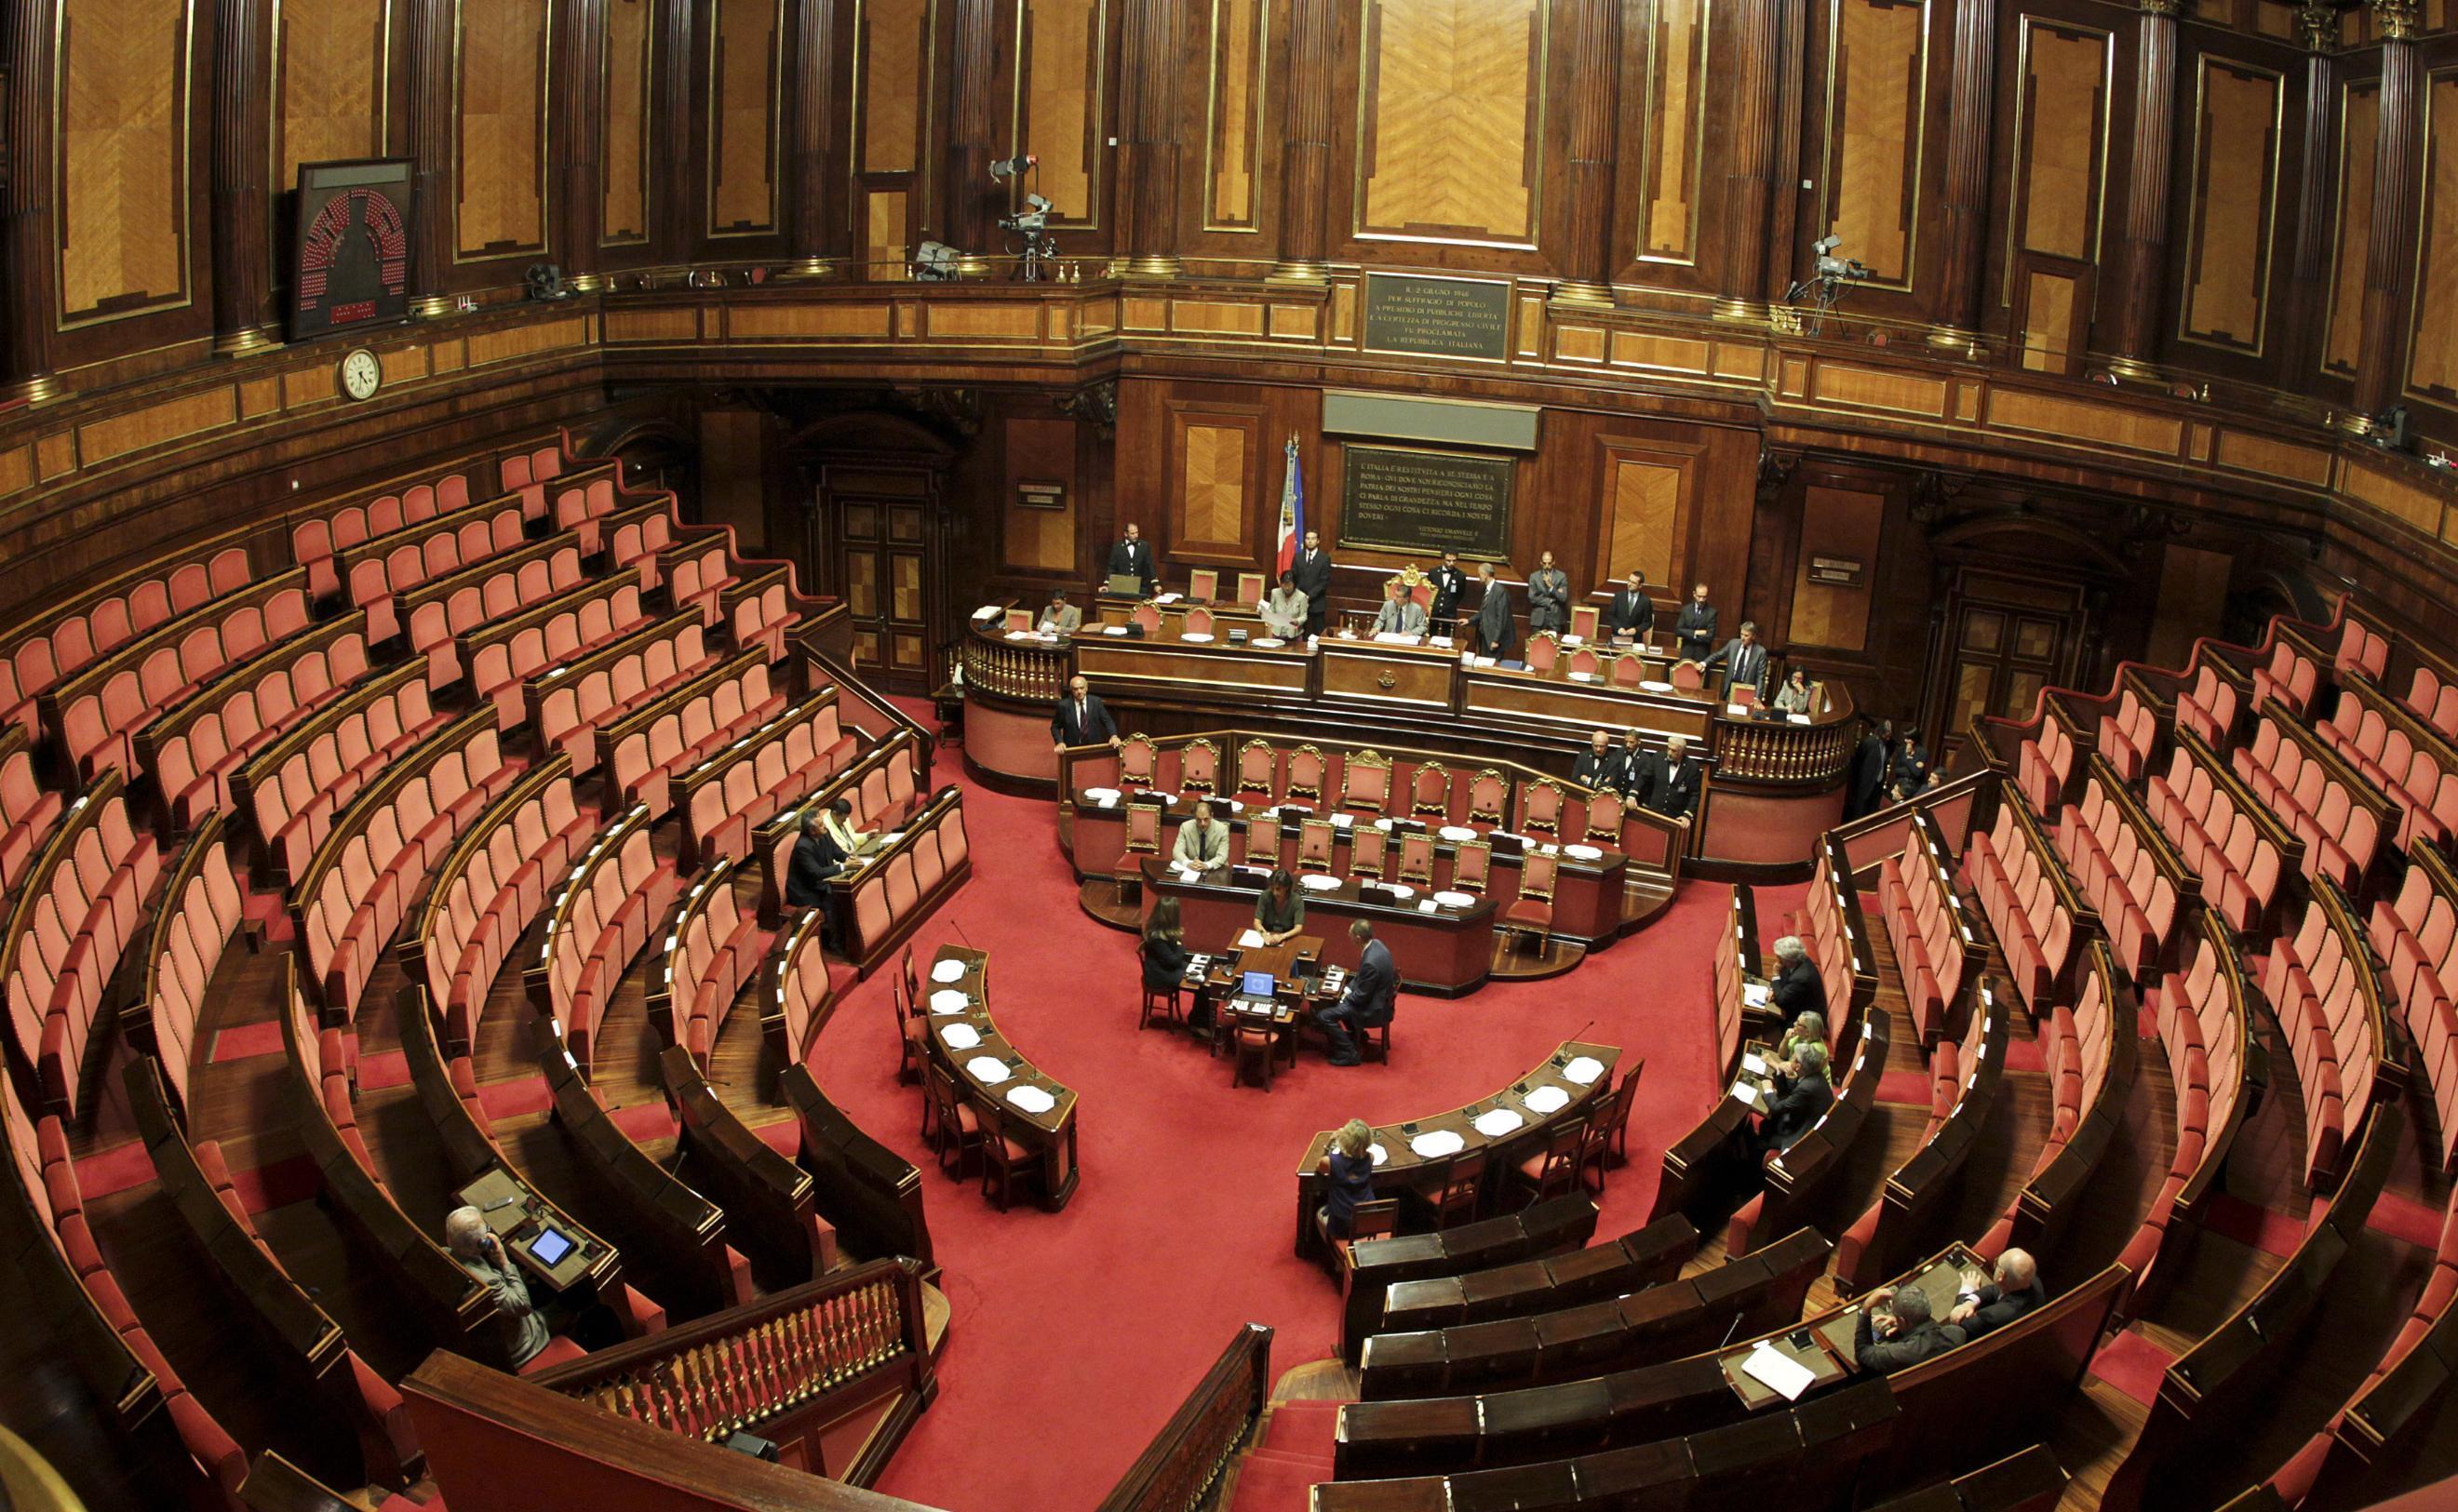 Taglio ai rimborsi dei partiti aula vuota deputati in for Numero senatori e deputati